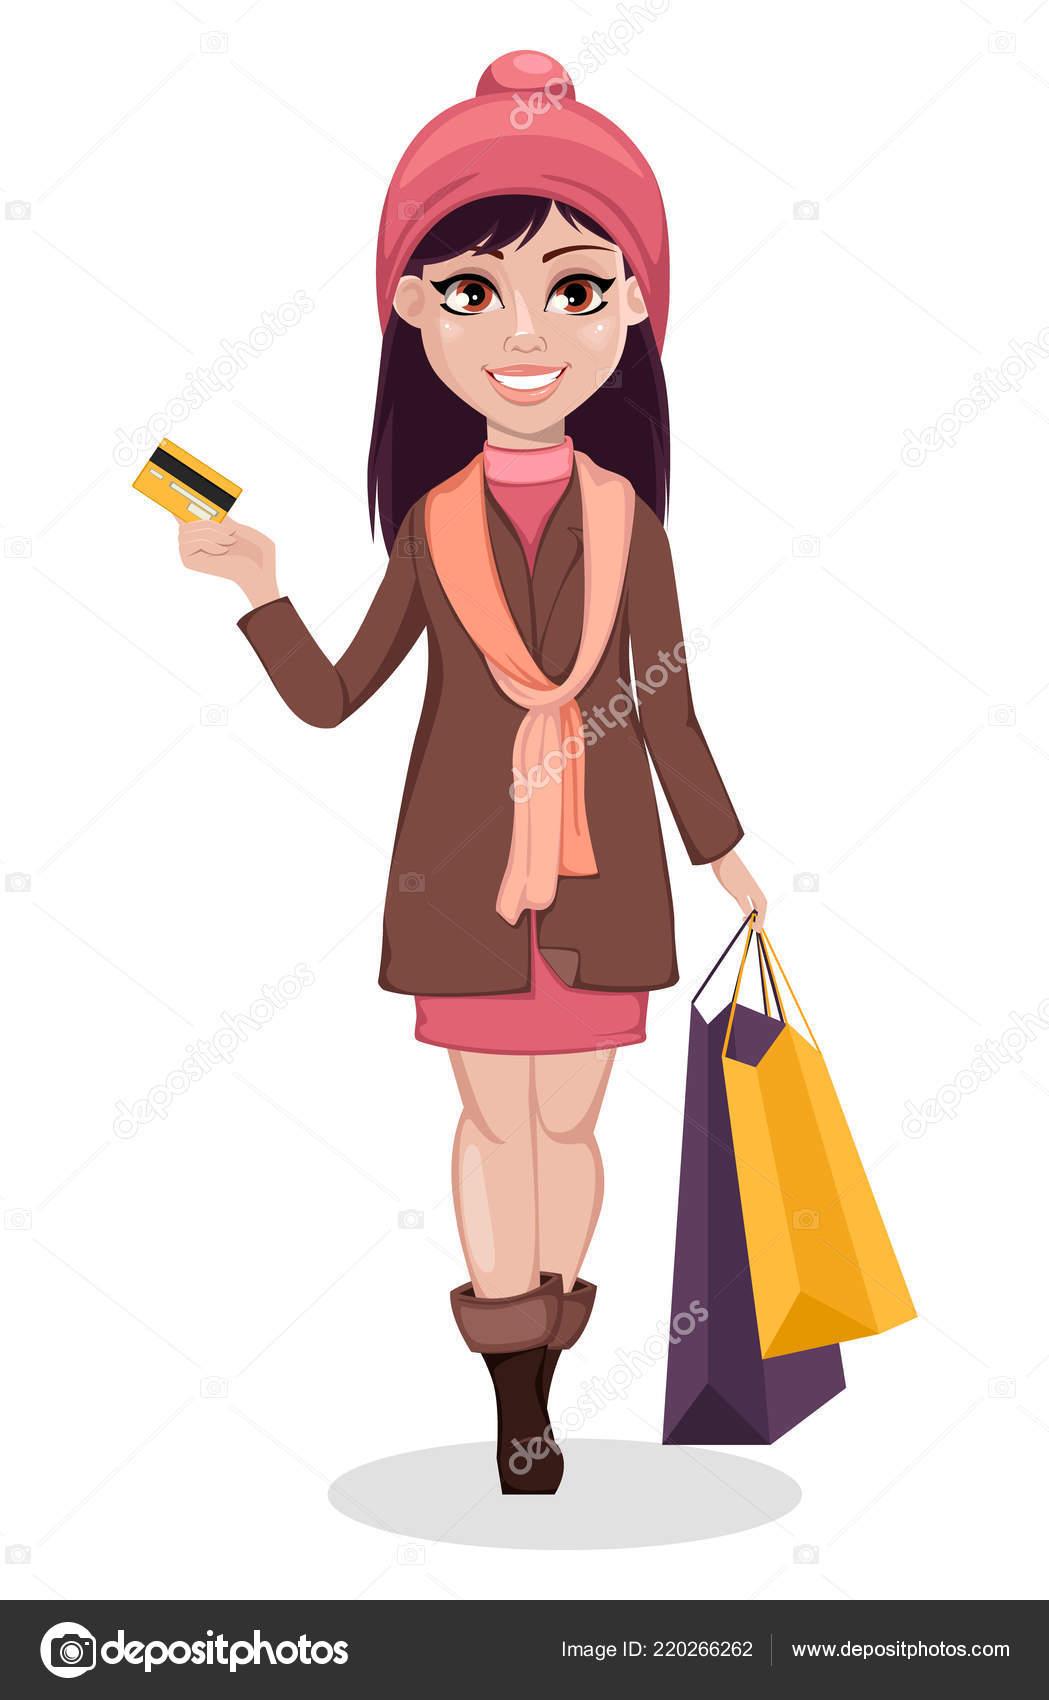 Black Friday Beautiful Girl Cartoon Character Holding Shopping Bags